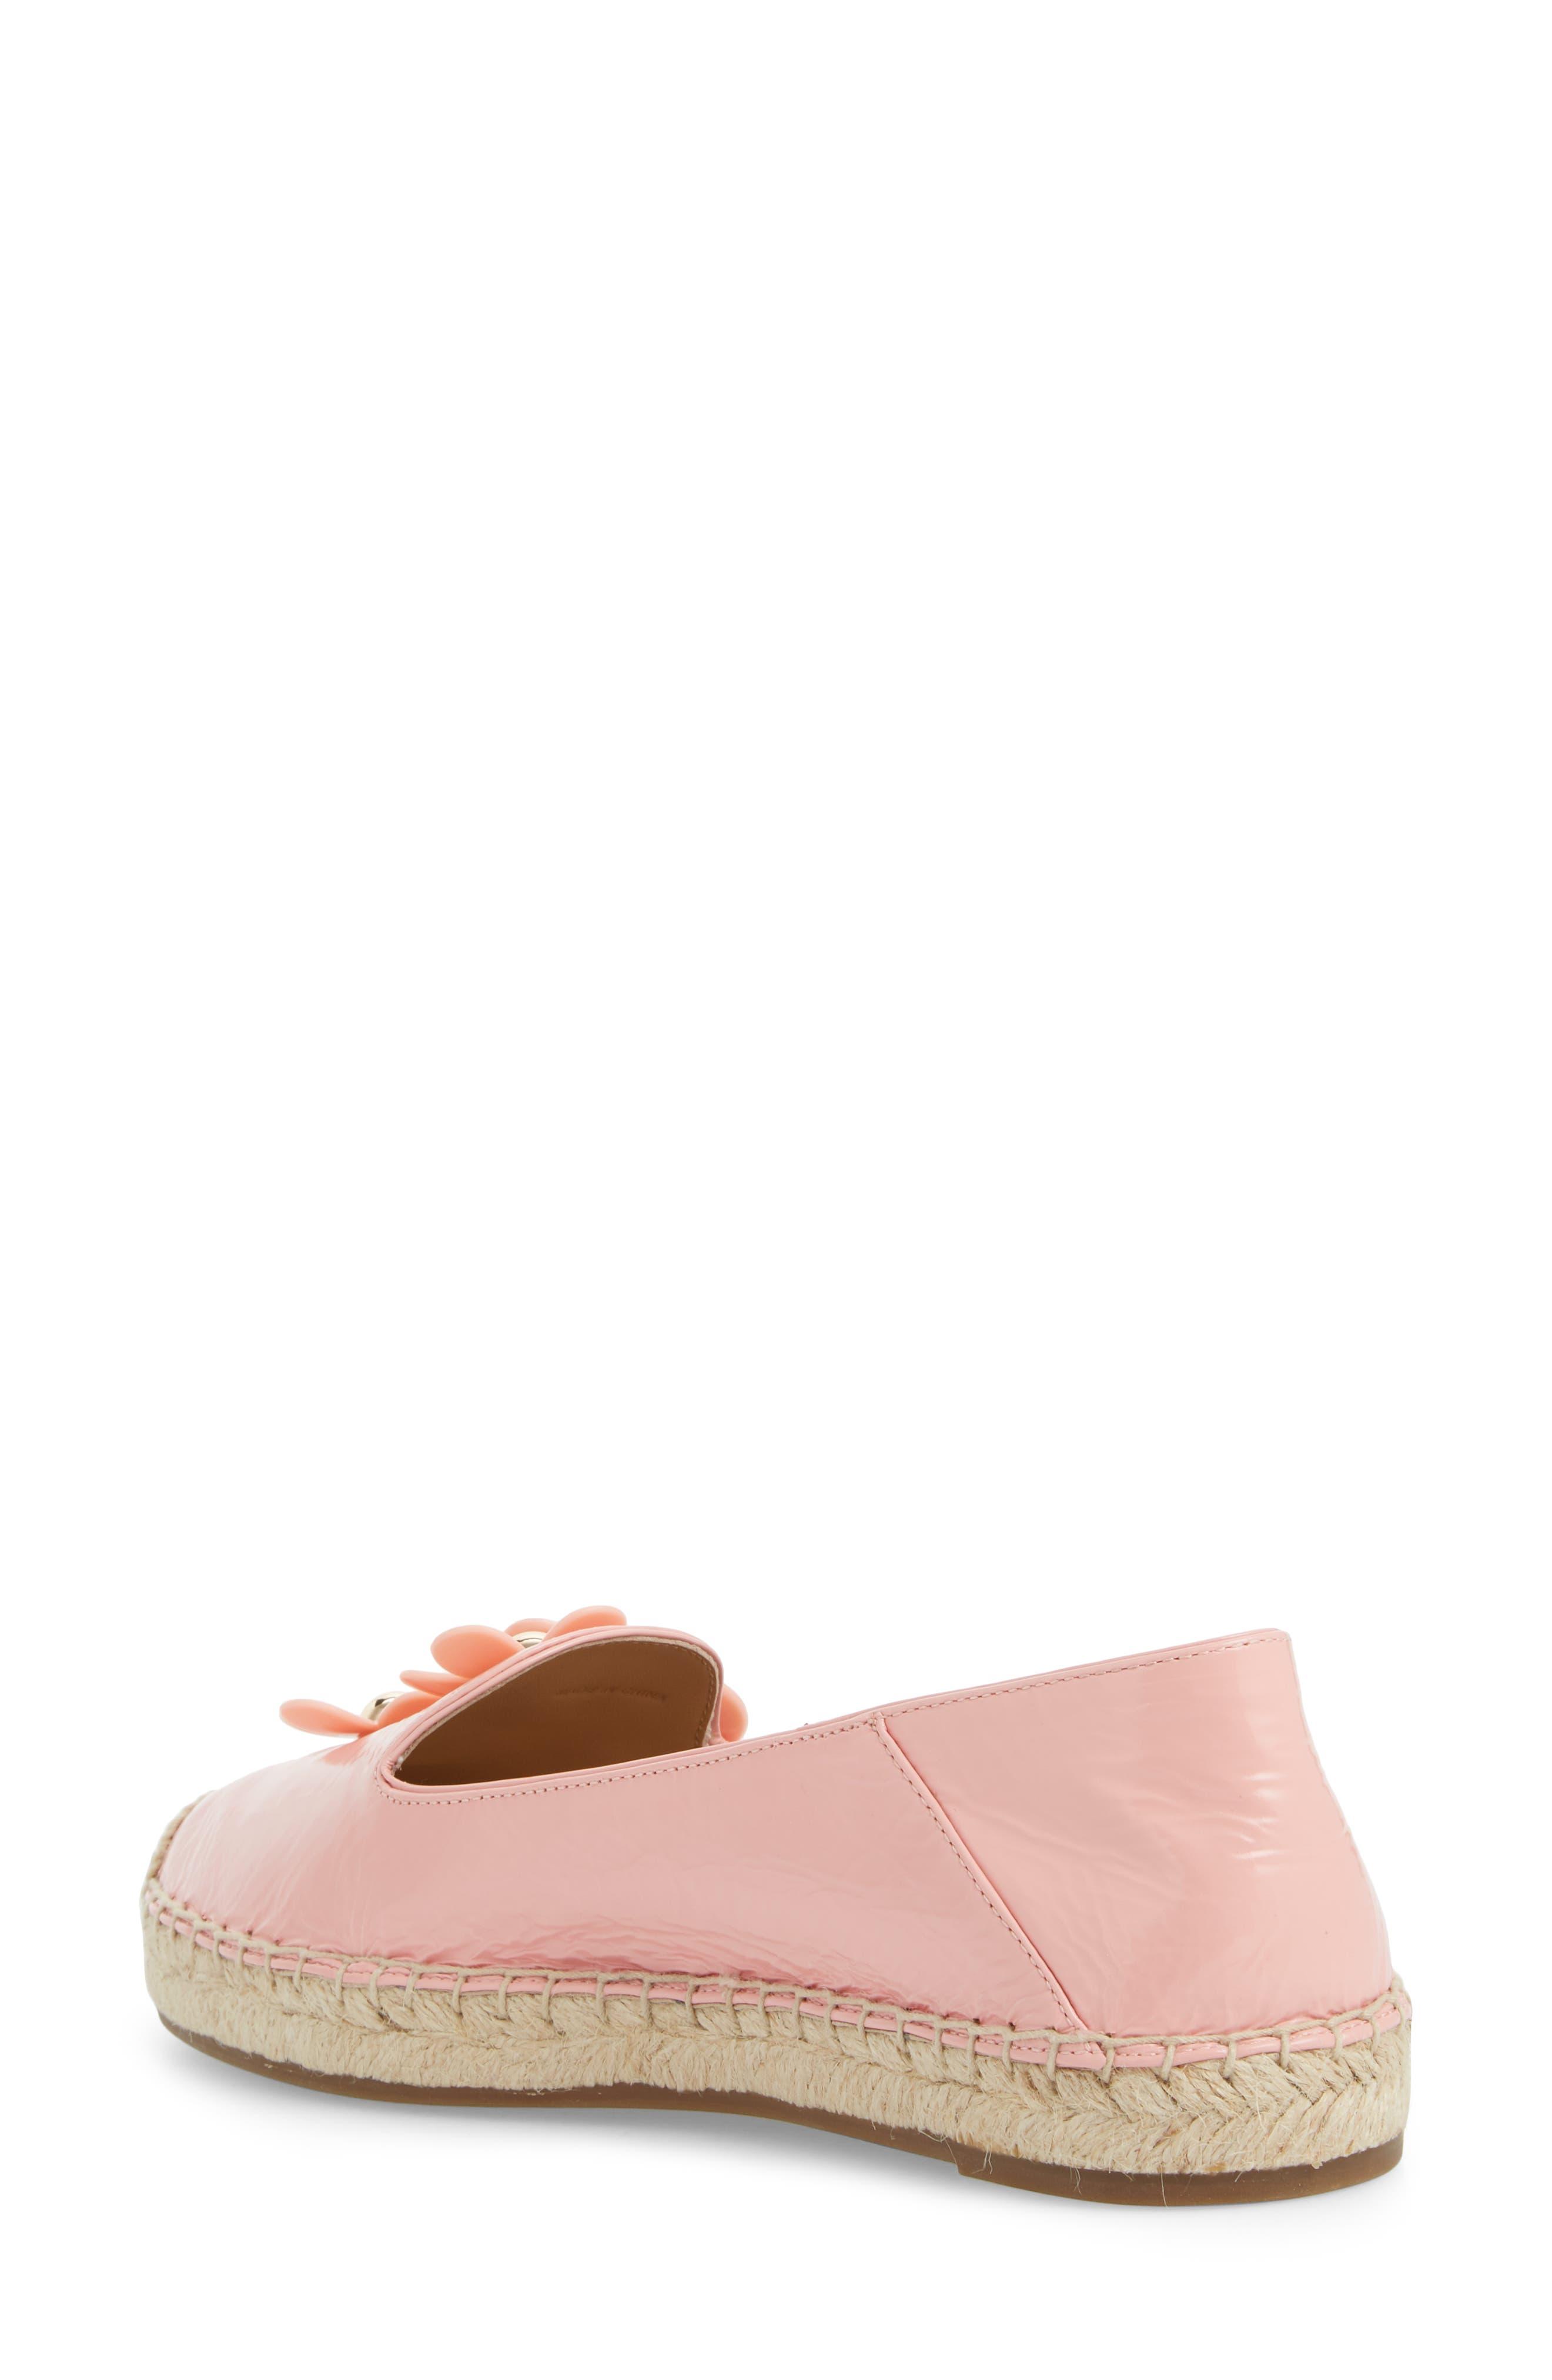 Daisy Studded Espadrille,                             Alternate thumbnail 2, color,                             Light Pink